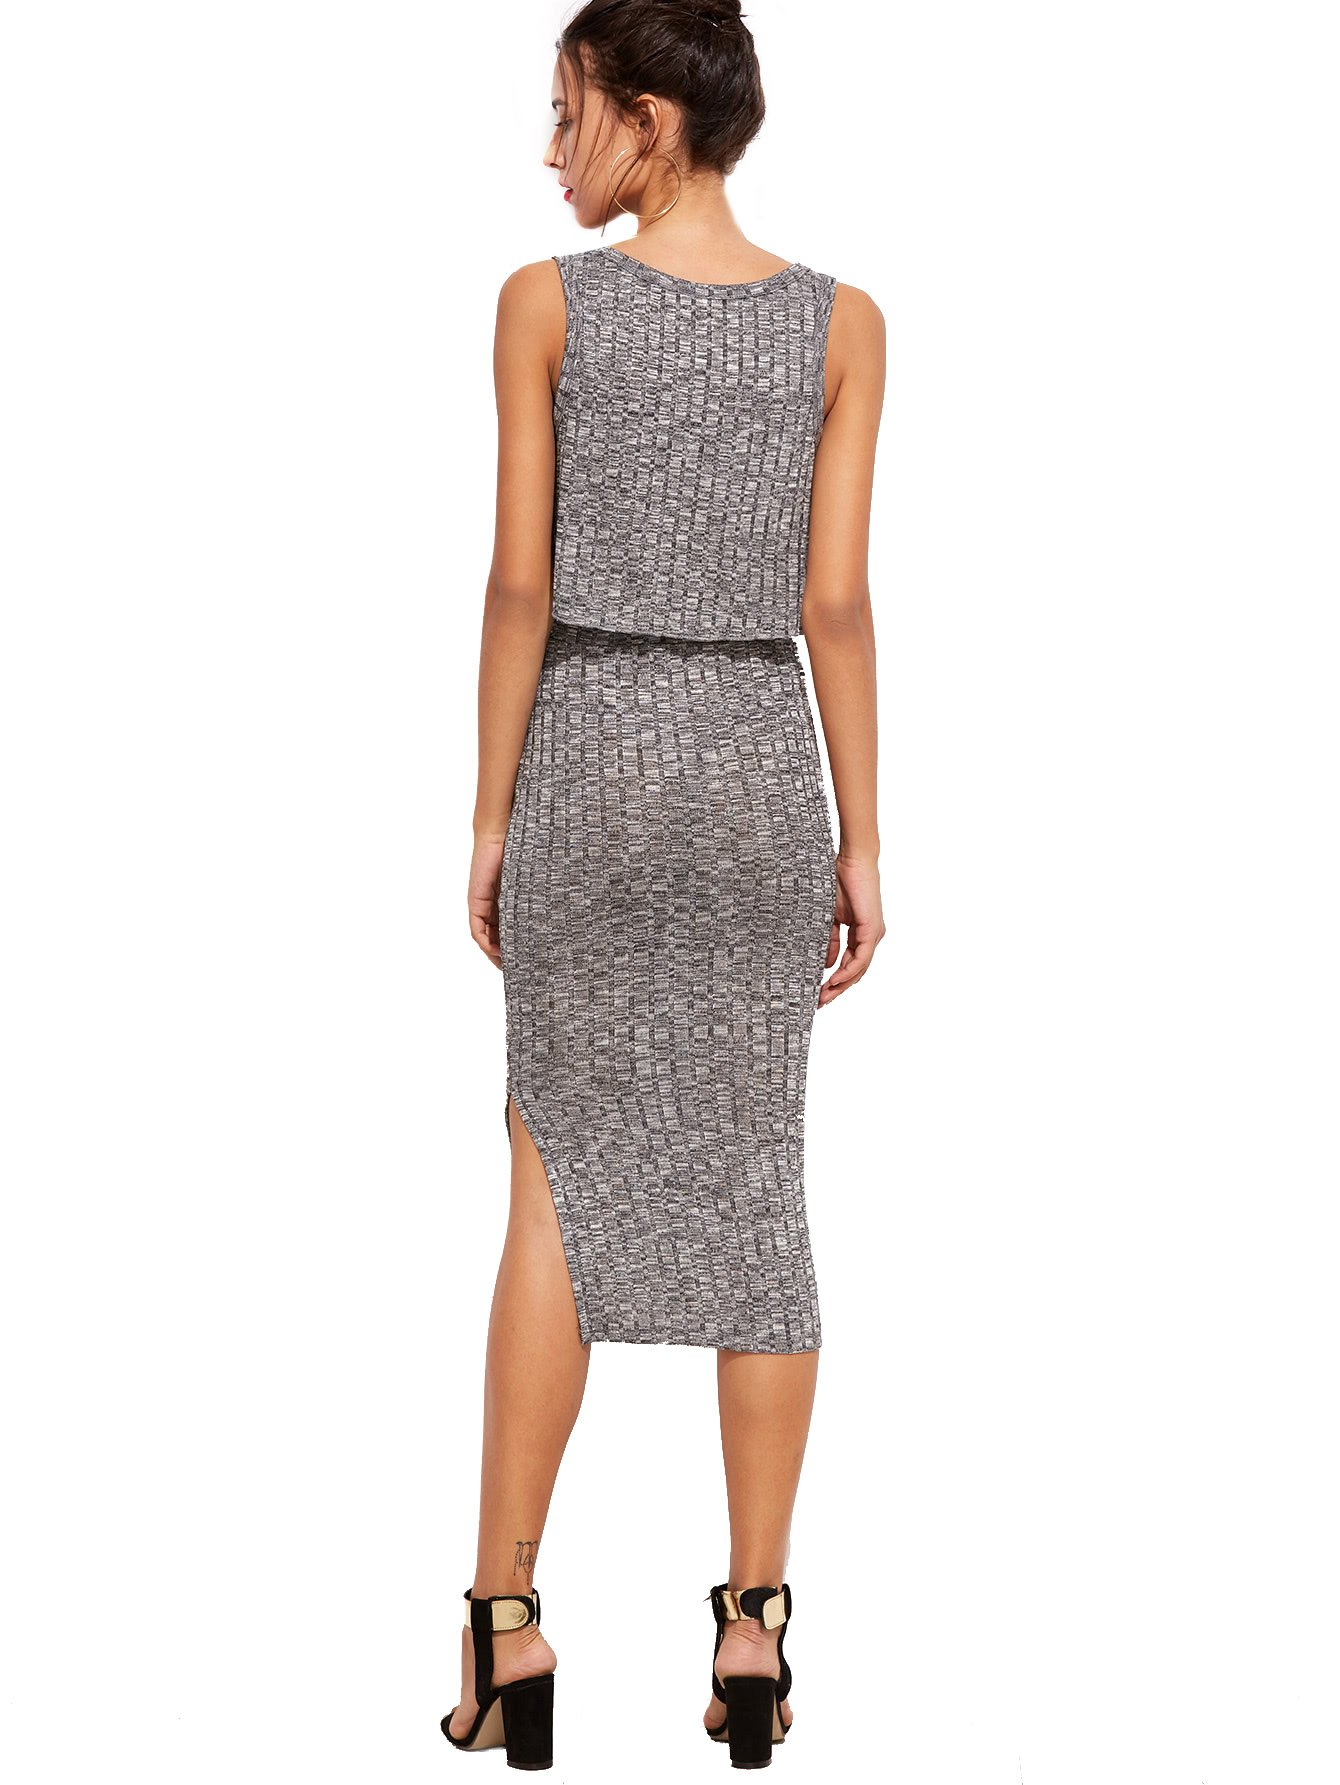 Romwe Women's 2 Piece Crop Tank Top with Skirt Set Sleeveless Bodycon Mini Dress 1-Gray Medium by Romwe (Image #2)